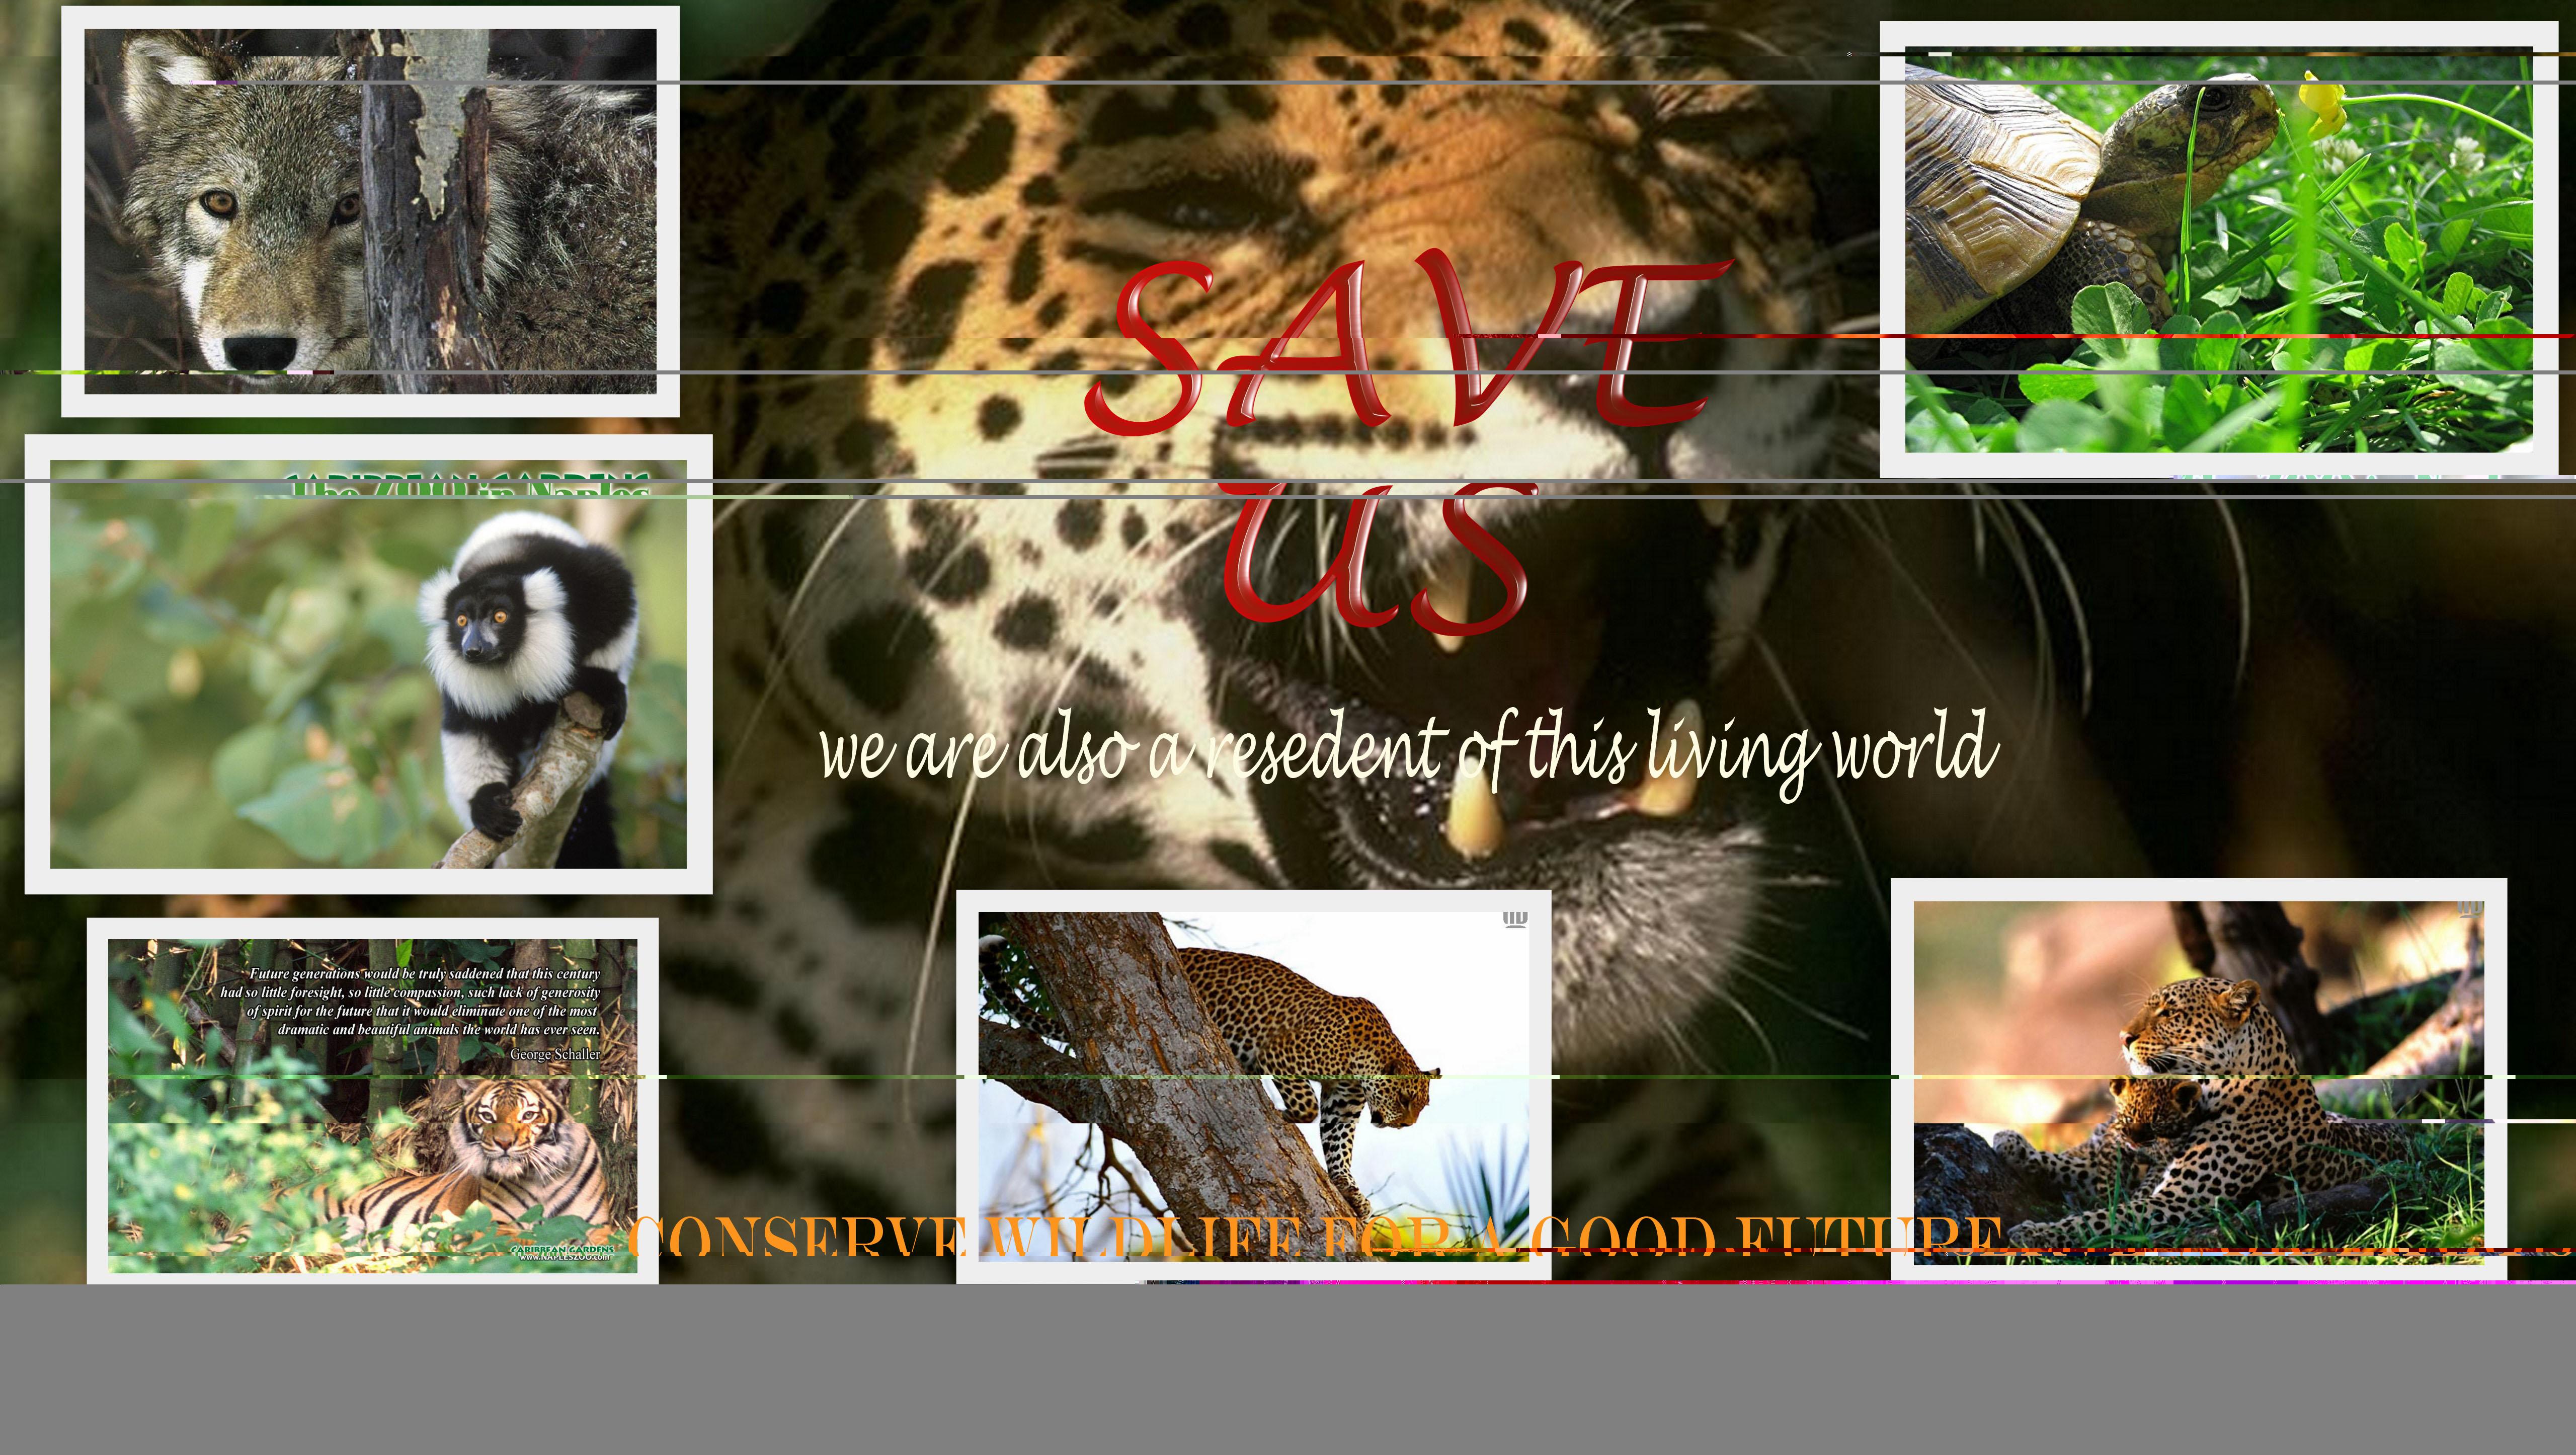 SAVE ANIMAL wallpaper   ForWallpapercom 5120x2891